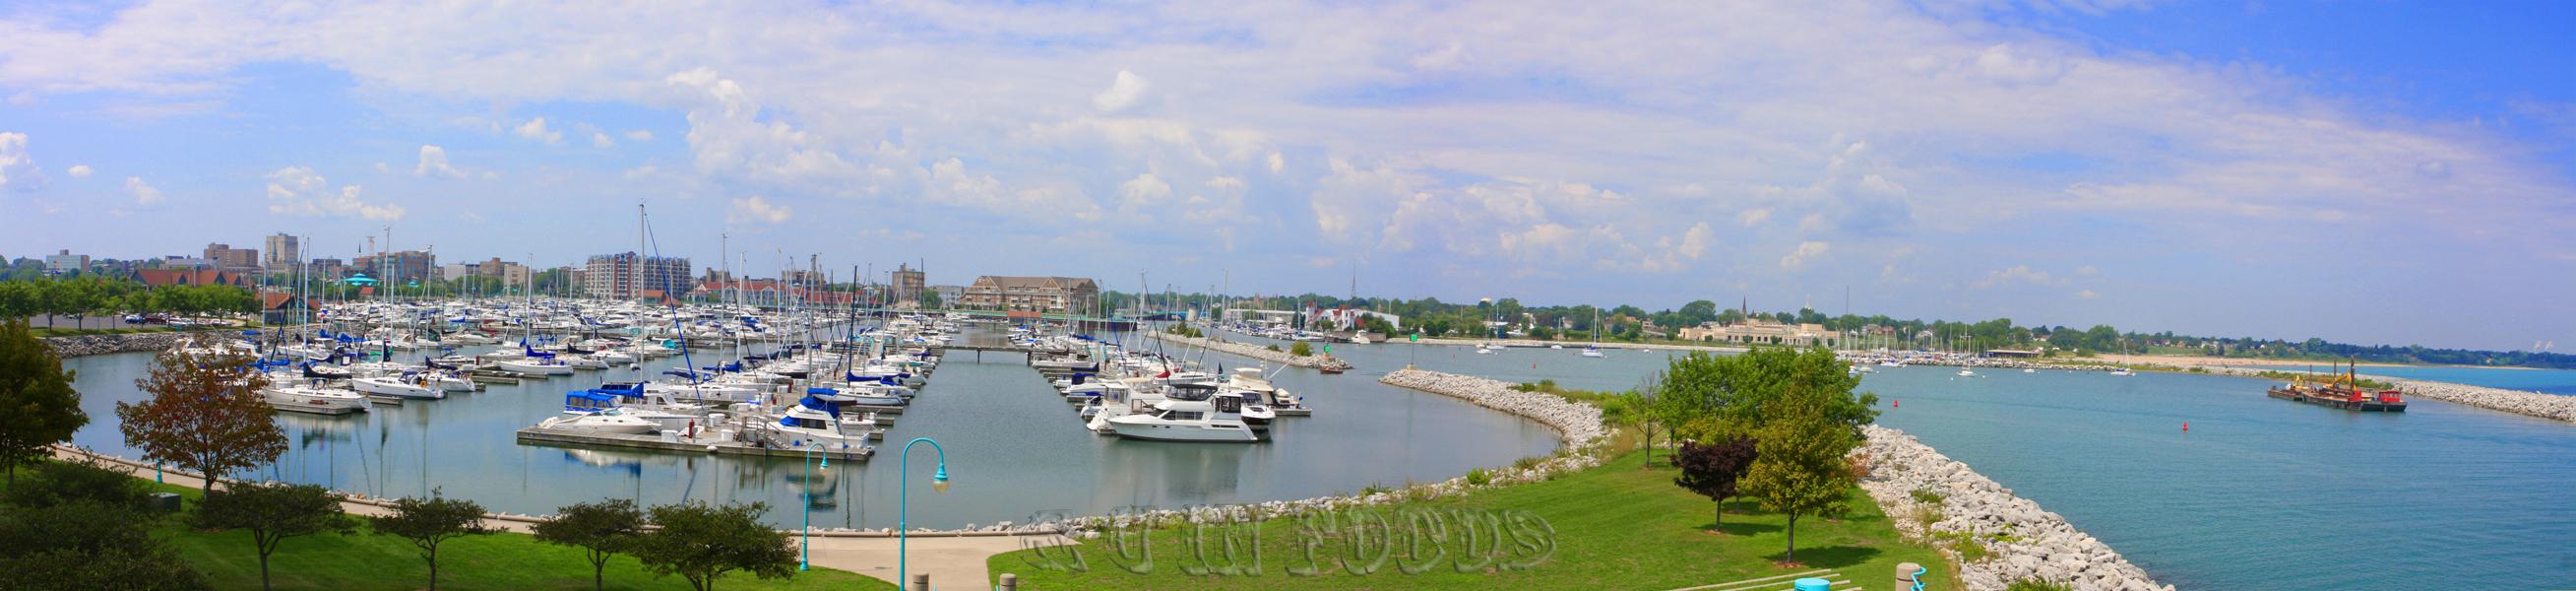 lake-michigan-harborsw_panorama1